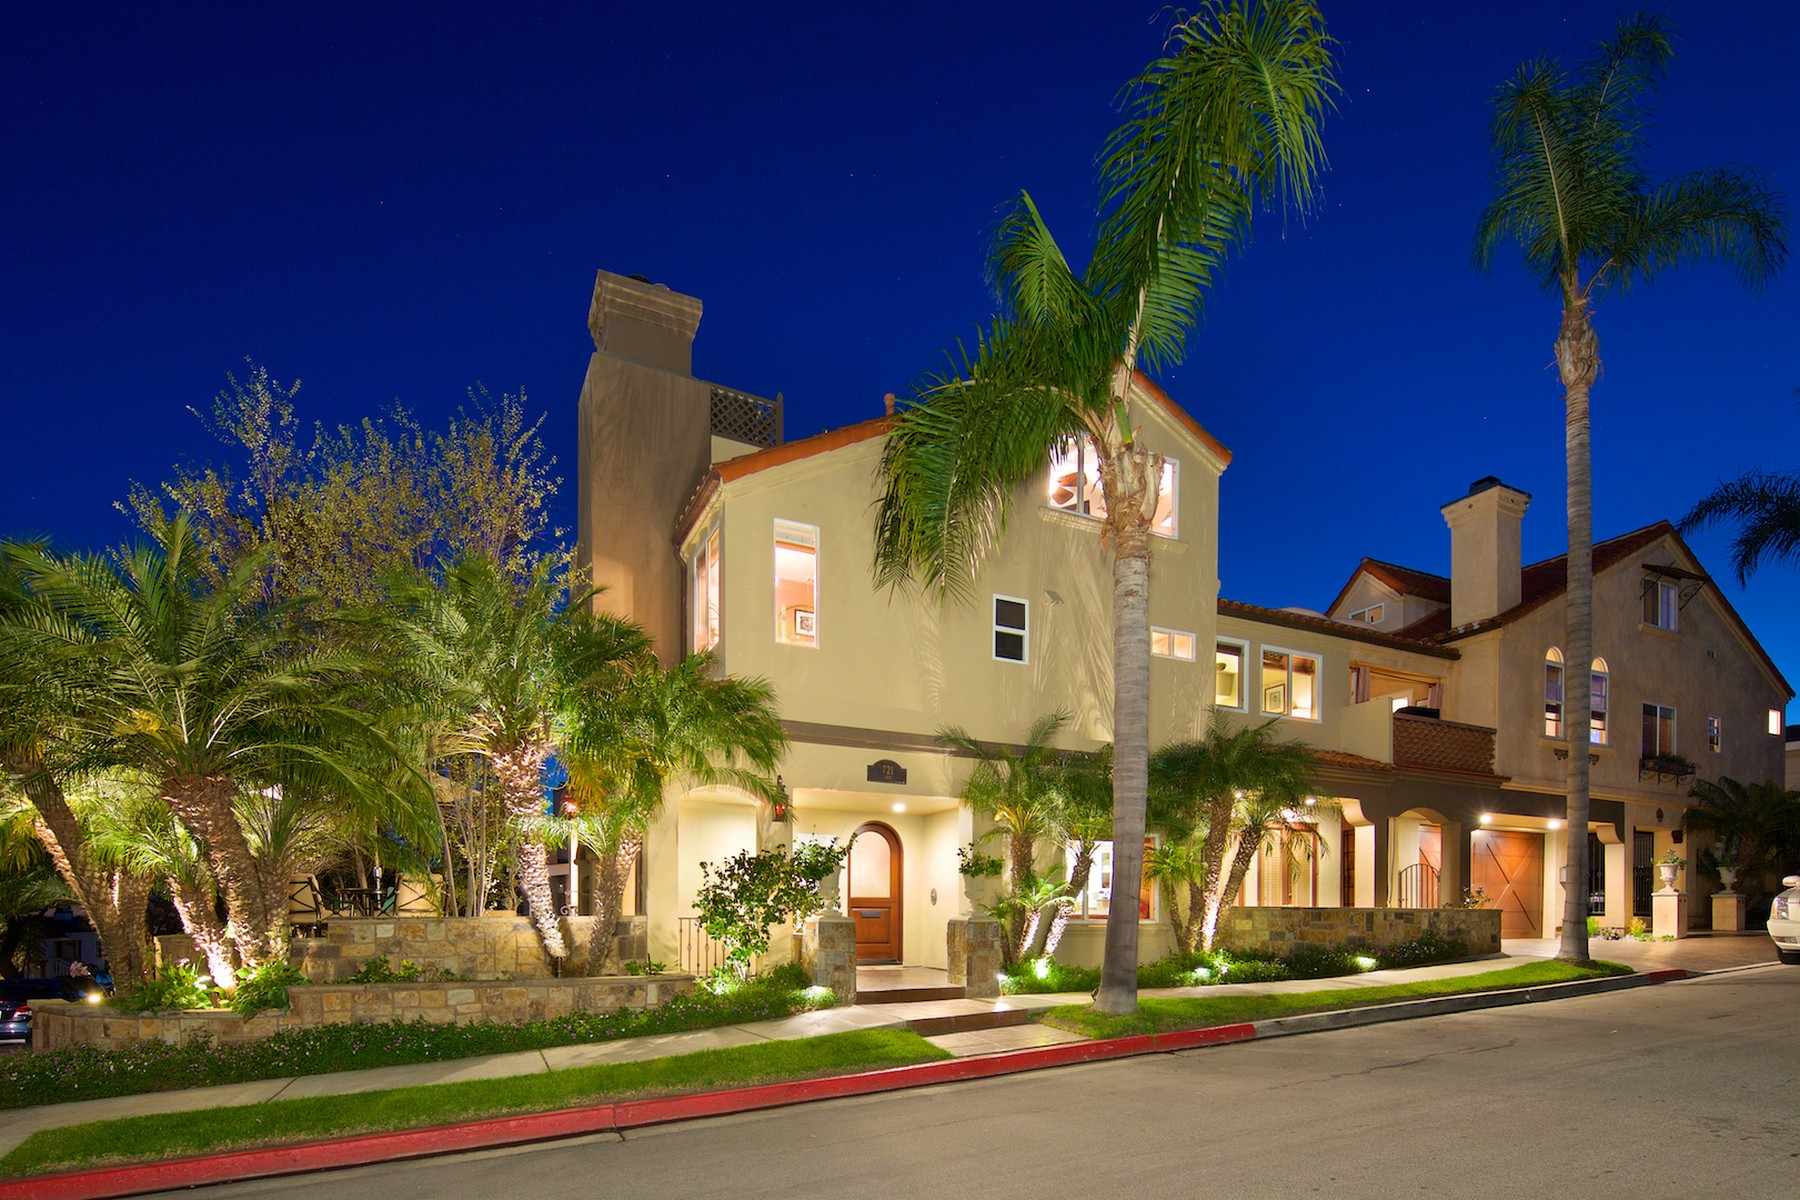 Condomínio para Venda às 721 Iris Avenue Corona Del Mar, Califórnia, 92625 Estados Unidos